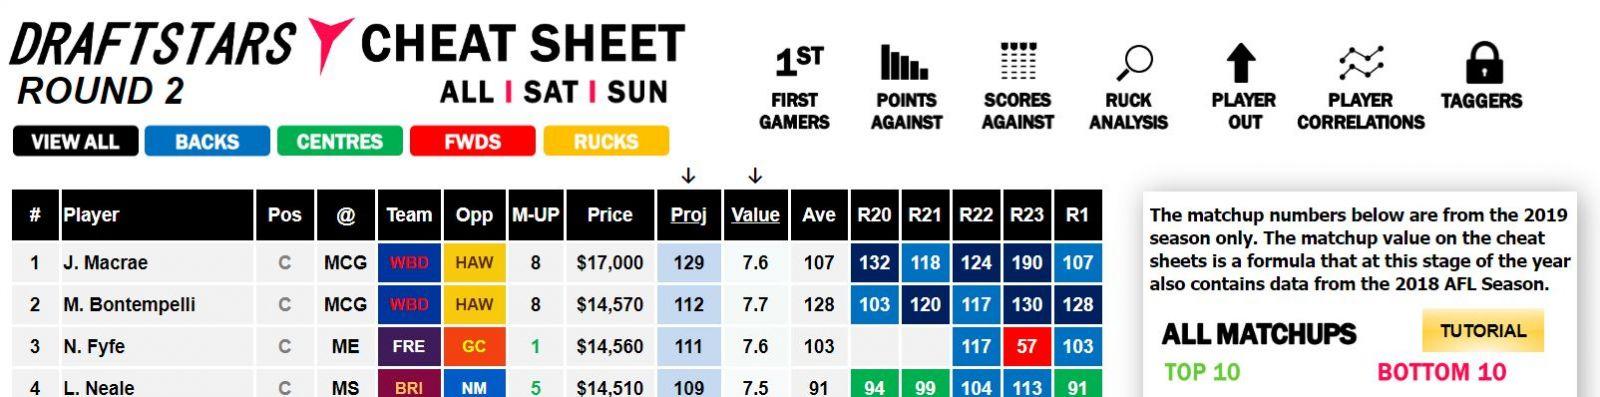 Draftstars AFL Round 2 Cheat Sheet